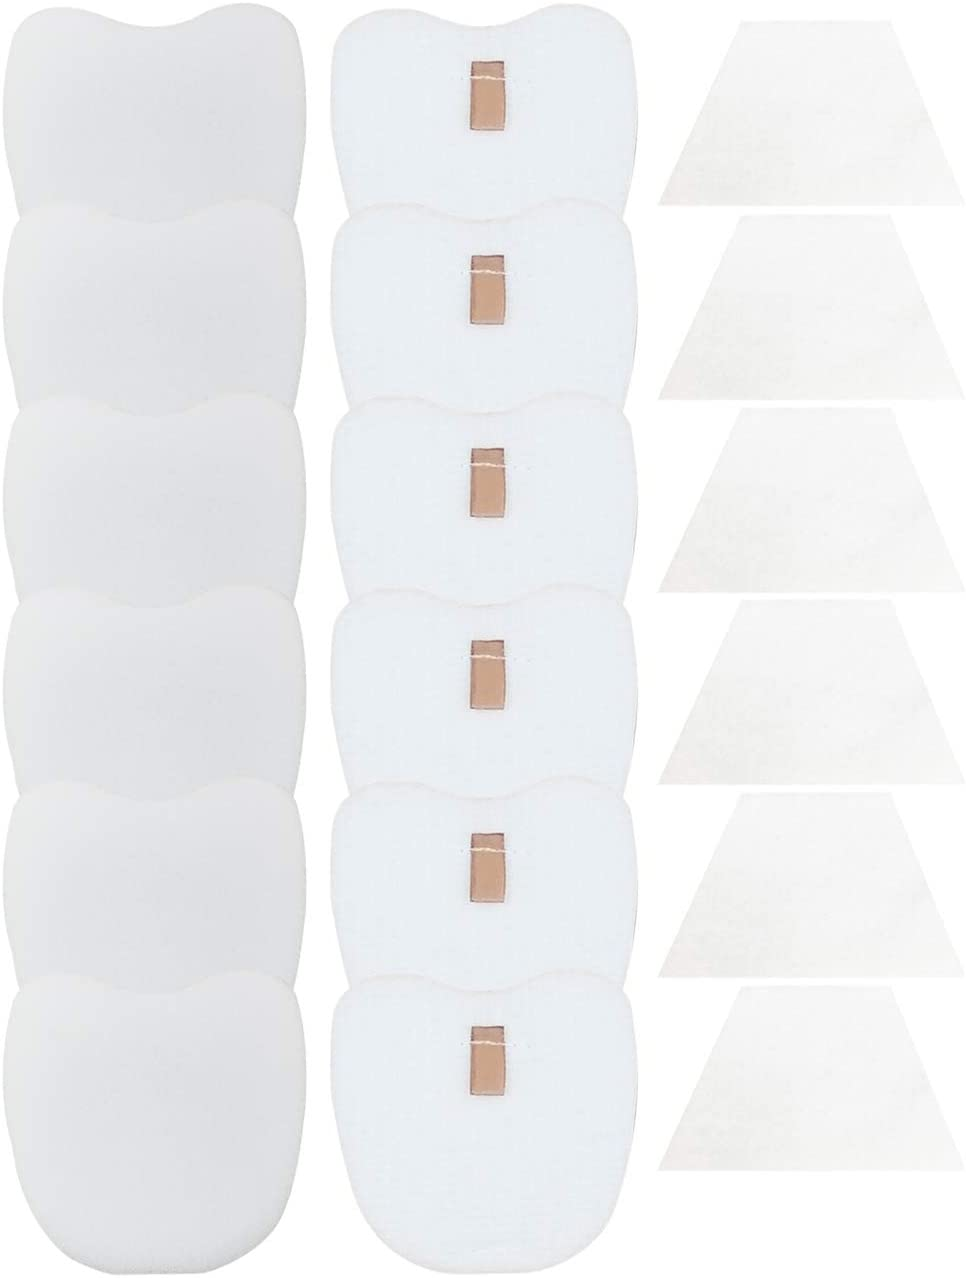 6 Pack Filters for Shark Rocket DeluxePro Zero-M Vacuum HV345, HV320, HV321, HV322, HV324Q, UV330, UV422, UV425, UV480, ZS350, ZS351, ZS352, Replacement Part XPMFK320 1084FTV320